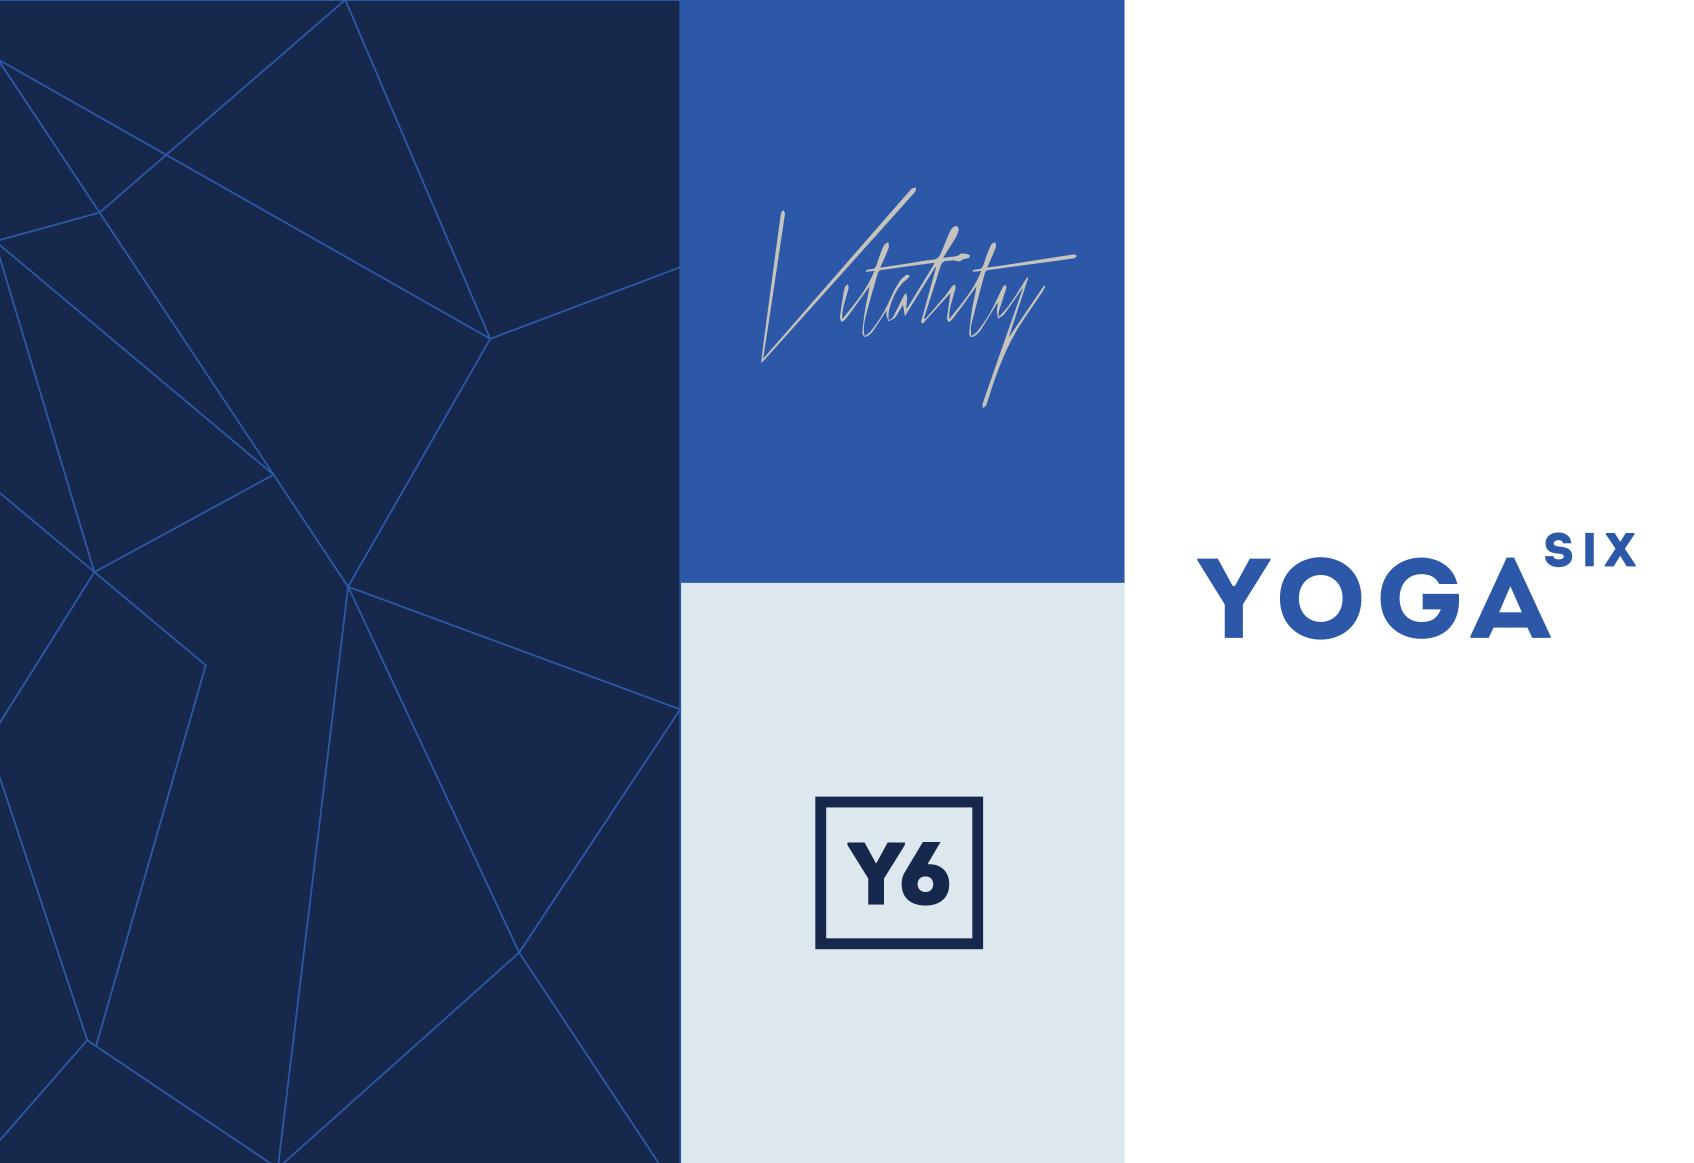 Allison-Henry-Yoga-Six-Identity-4.jpg